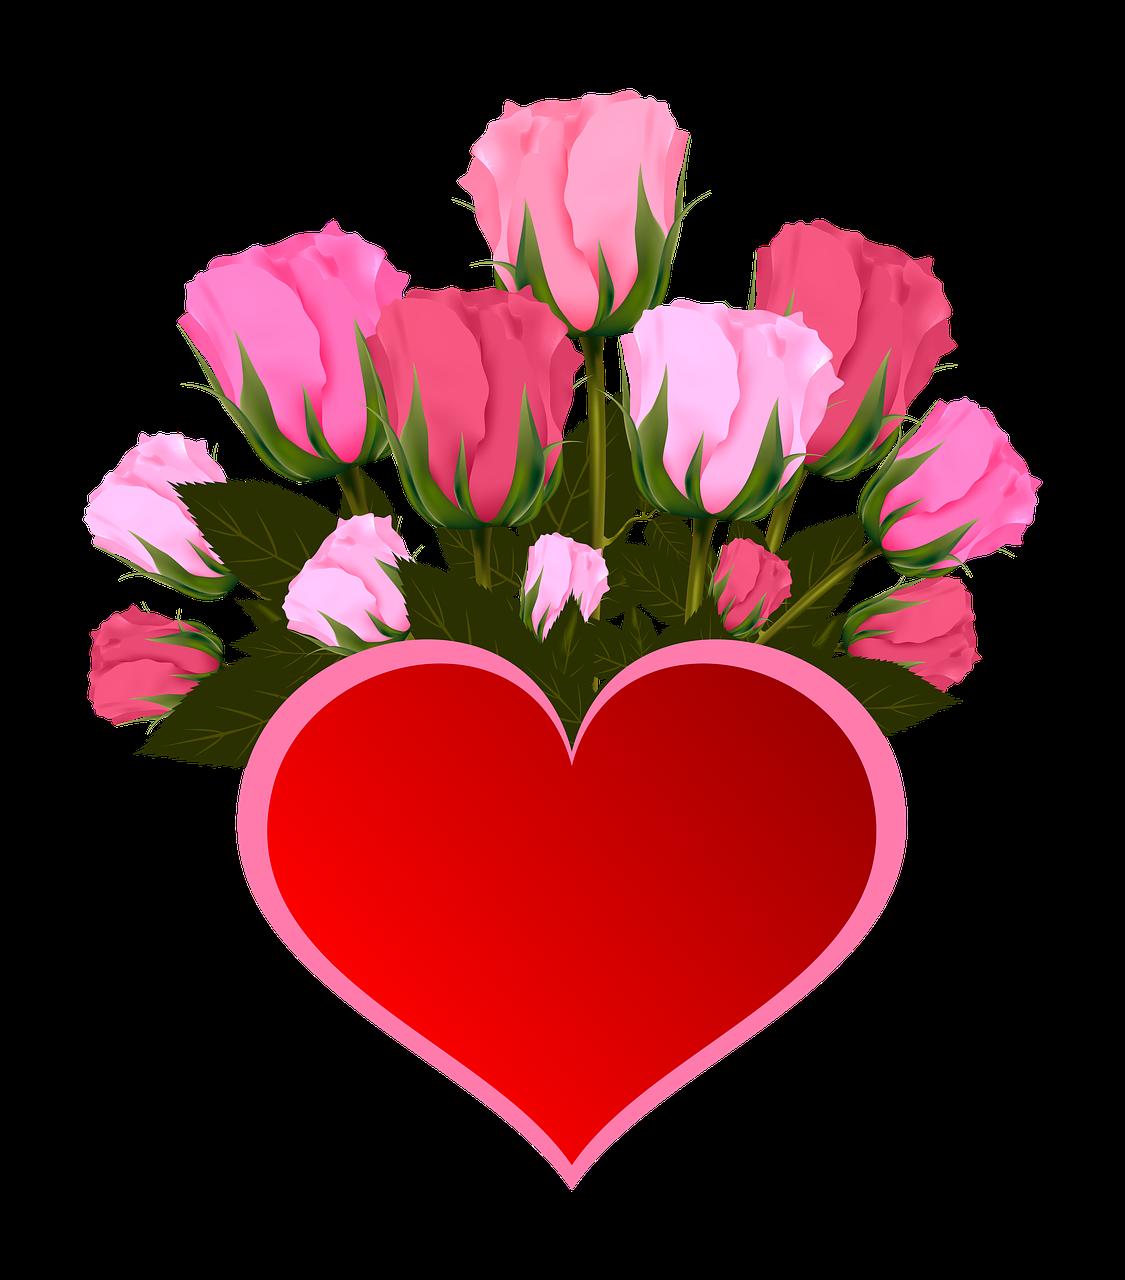 Gratis billede p pixabay. Heart clipart bouquet